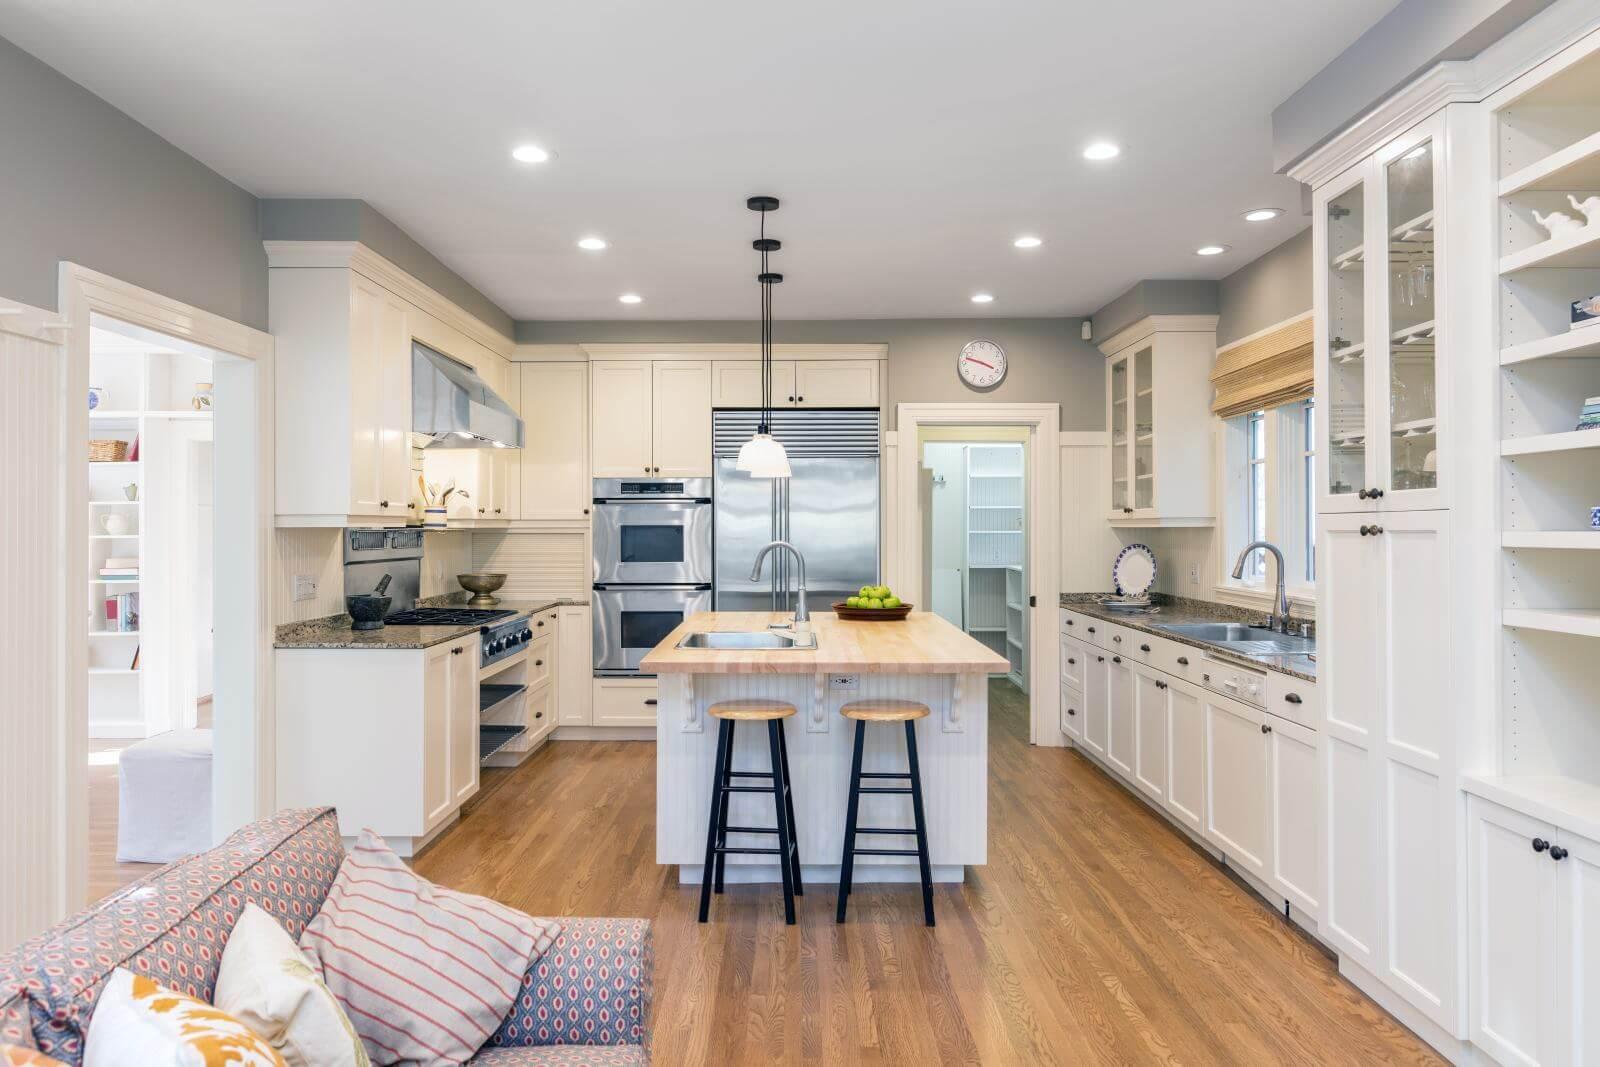 Amazing Luxury Kitchen Interior in white with wooden floor and kitchen island.